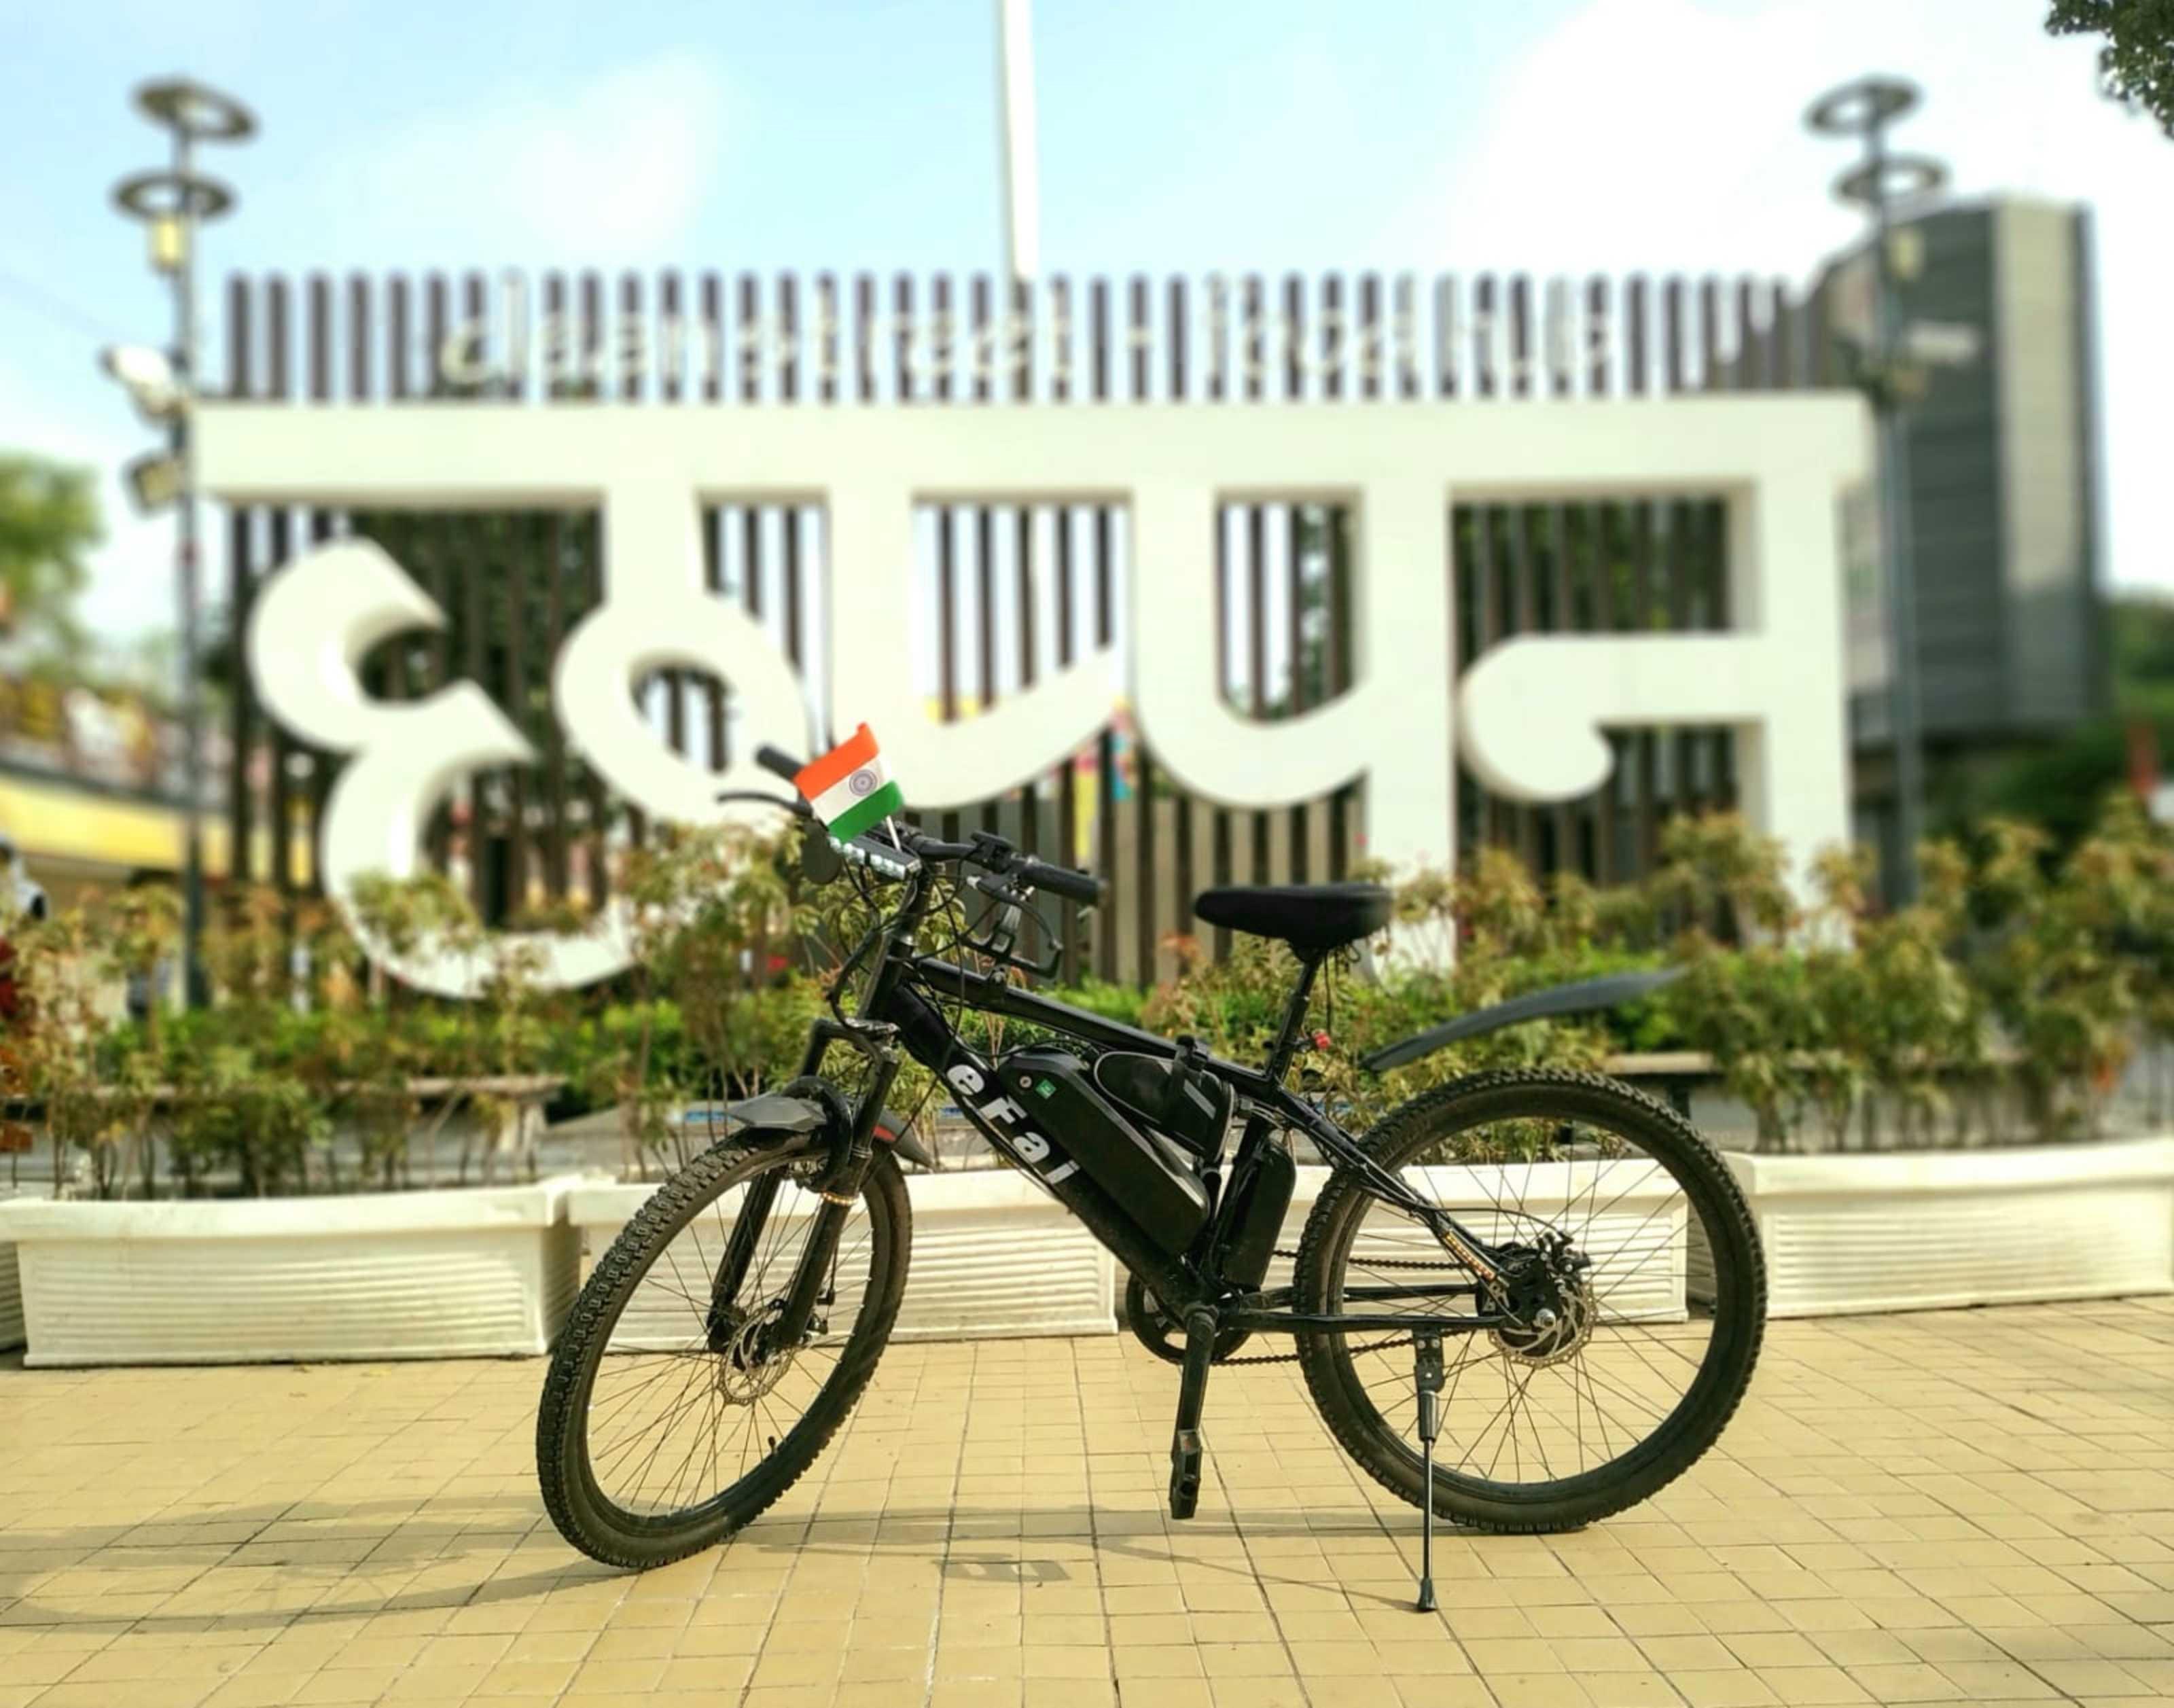 Engineers Day Indore: युवाओं ने नौकरी छोड़ 20 लाख लगाकर शुरू कर दिया इलेक्ट्रिक साइकिल का उत्पादन